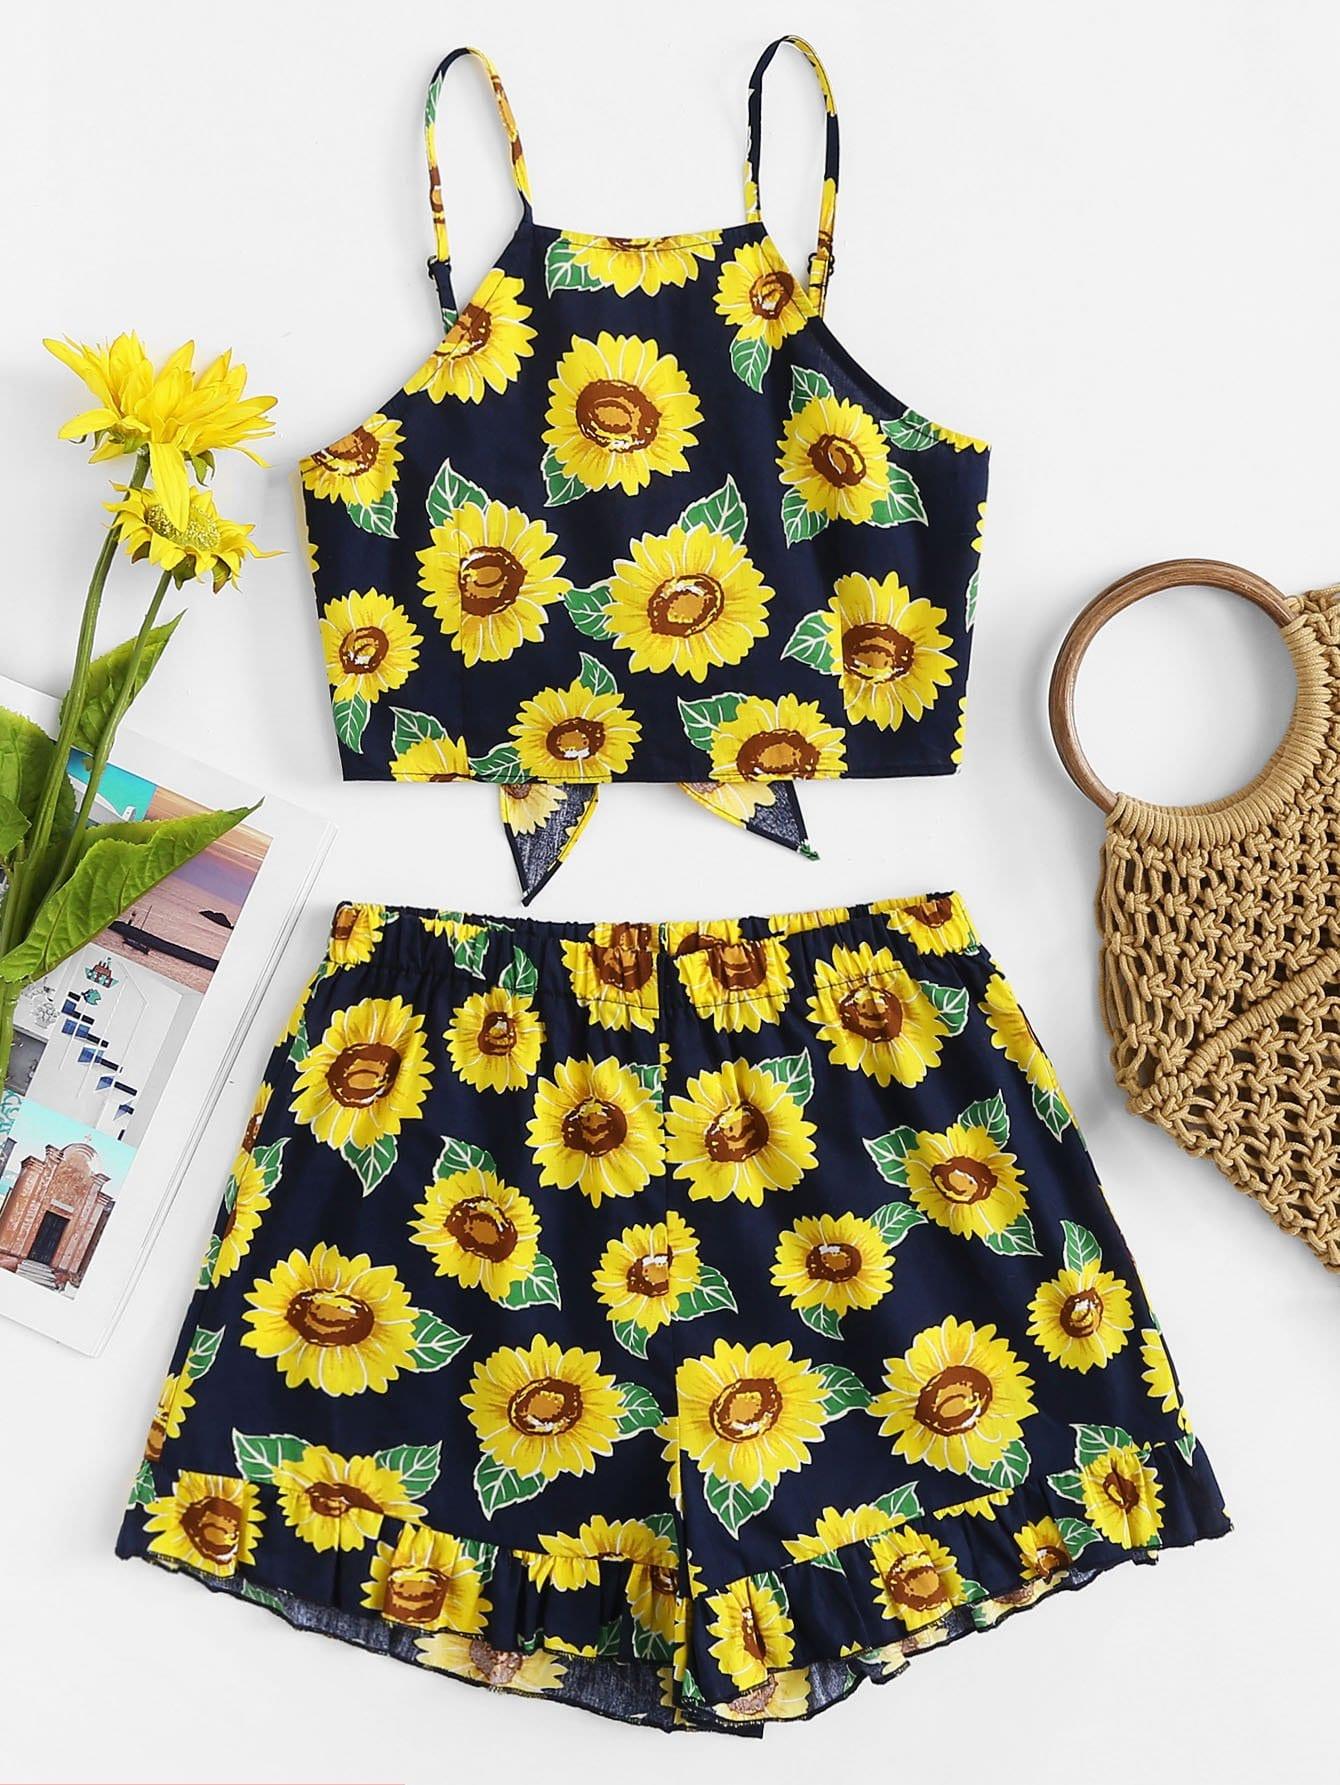 Sunflower Print Crop Top With Shorts sunflower print crop tee